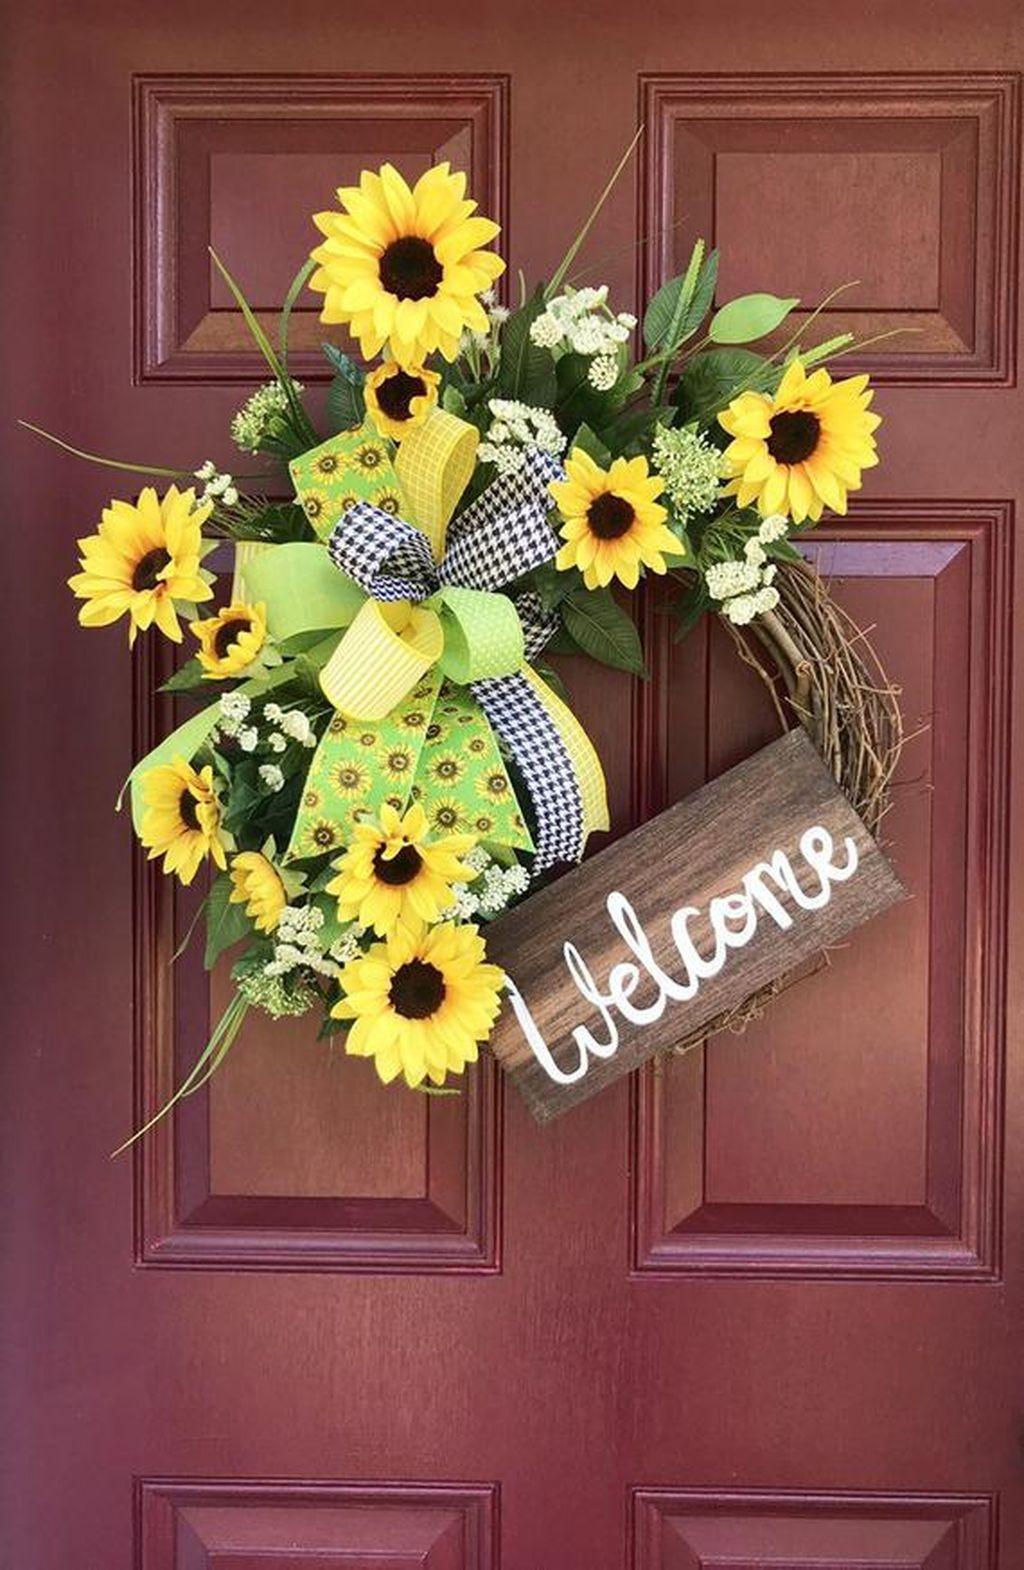 Inspiring Thanksgiving Front Door Decor Ideas 09